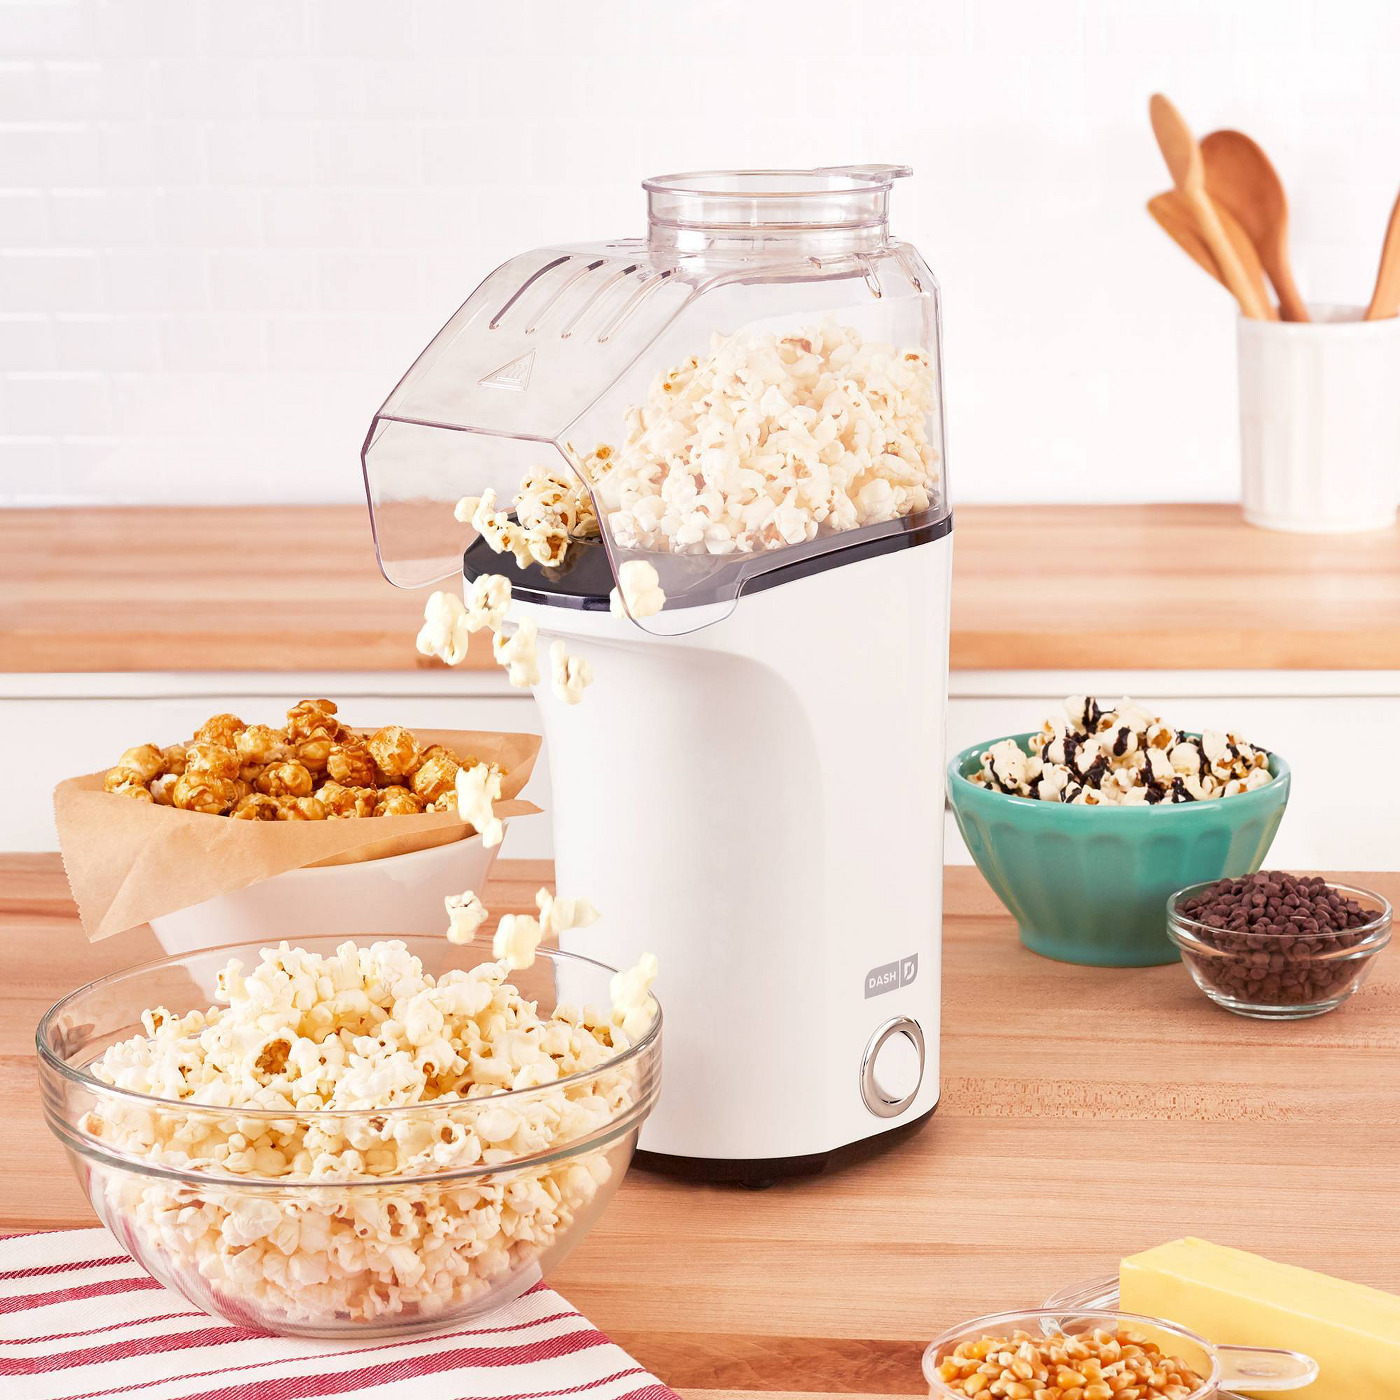 White dash popcorn maker pouring popcorn into a bowl